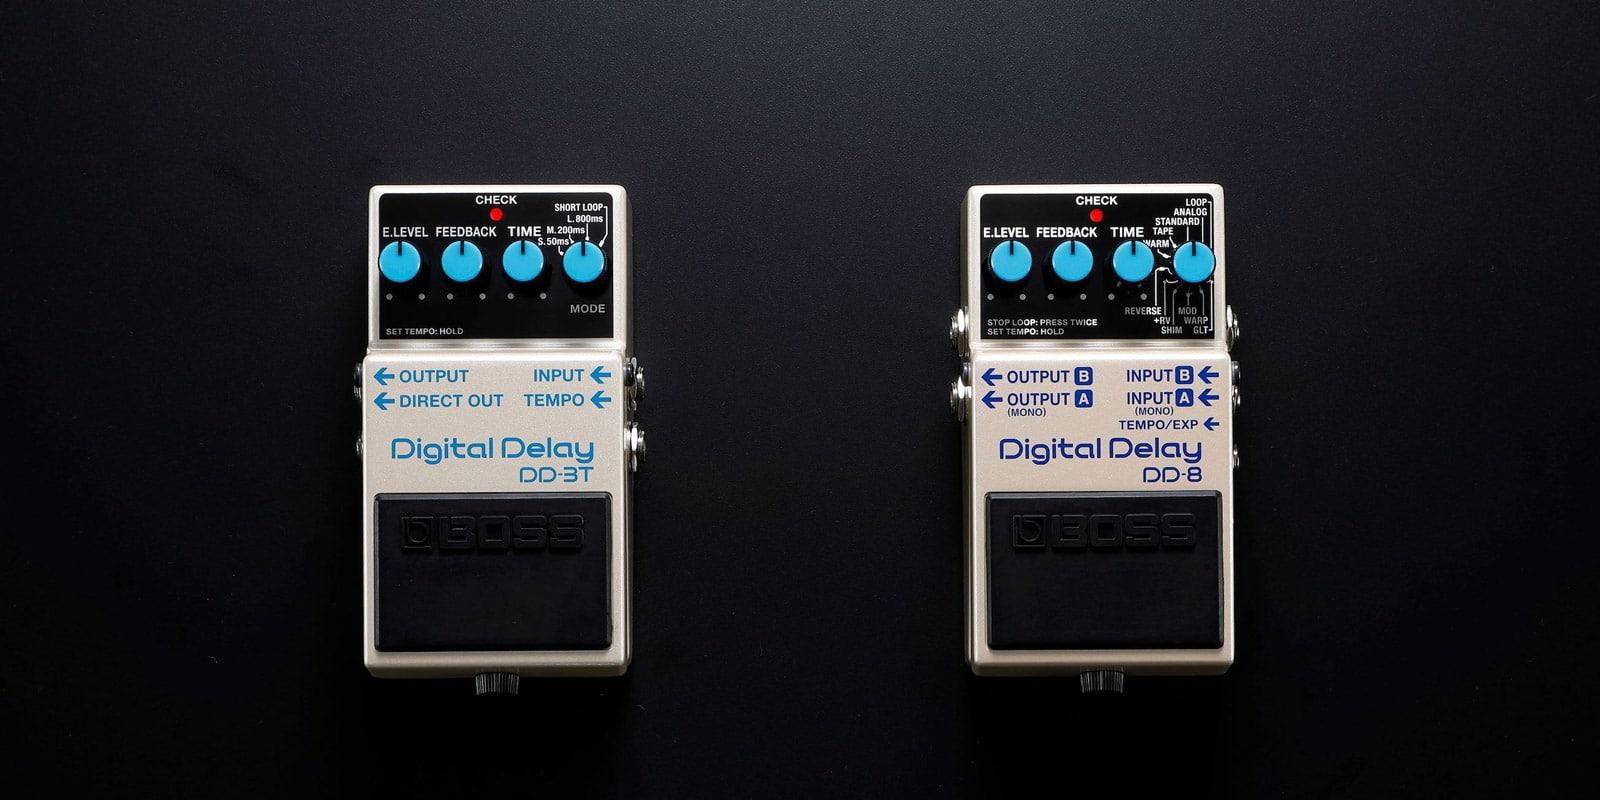 BOSS Announces DD-3T and DD-8 Digital Delay Pedals